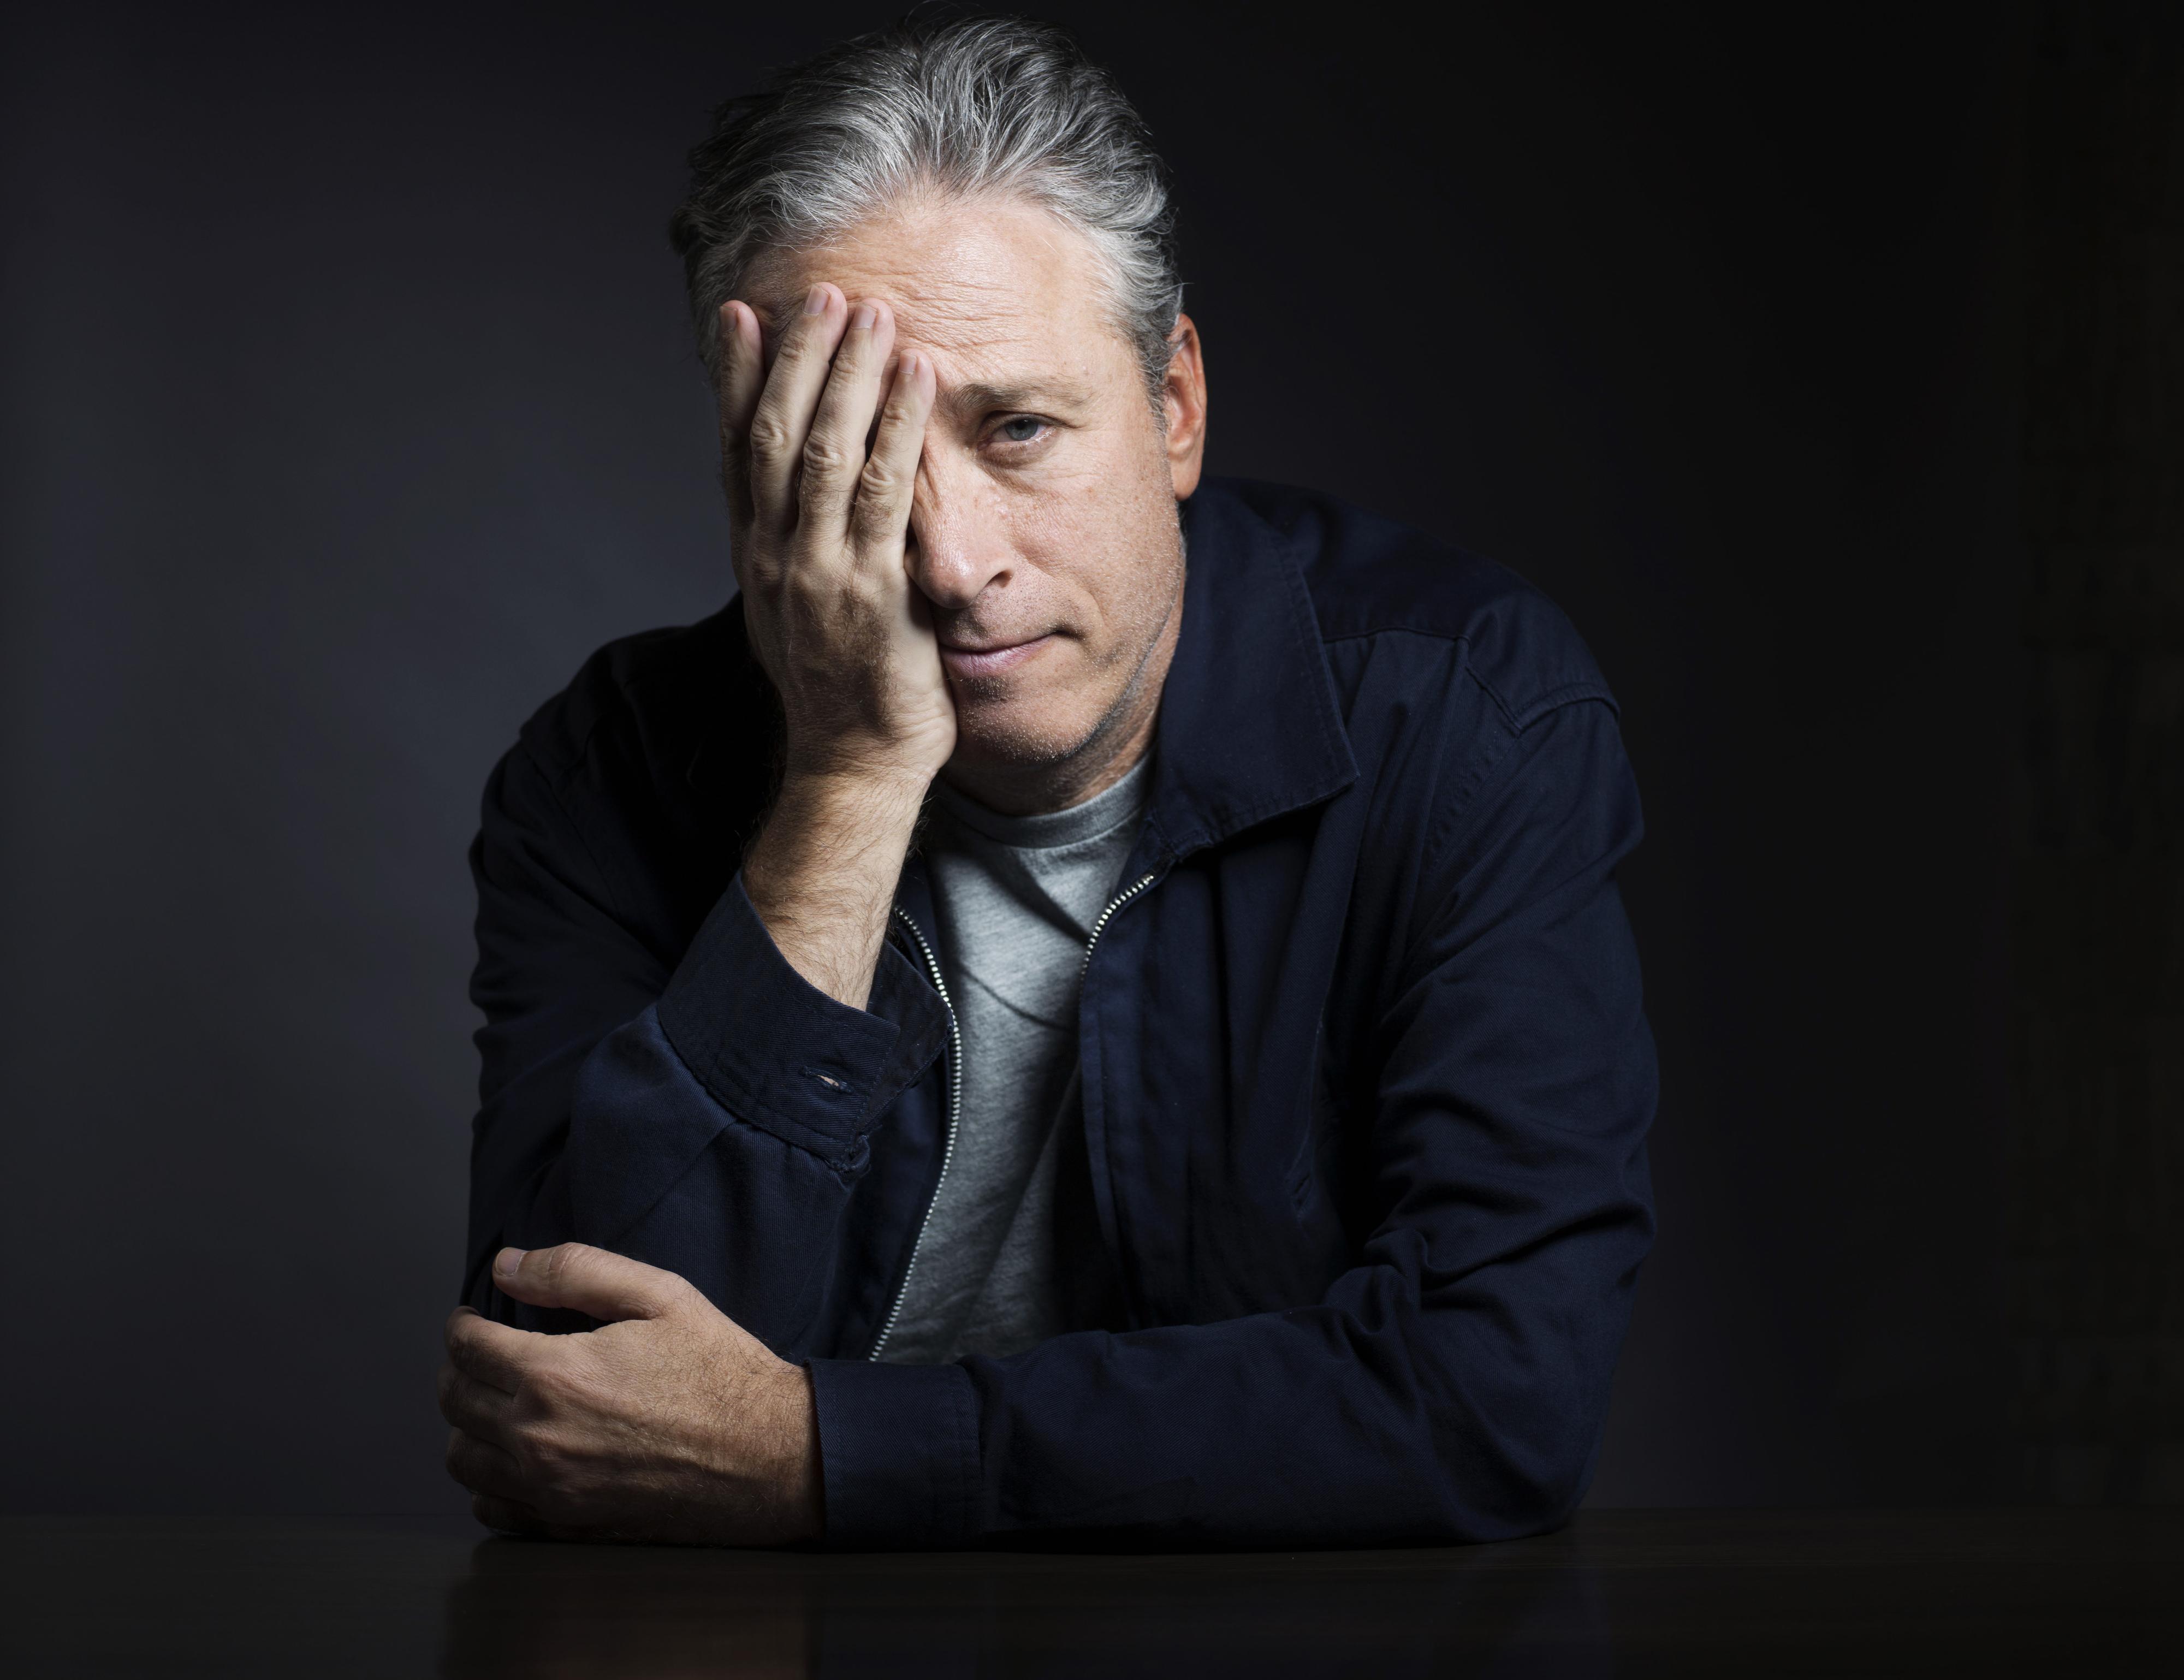 Jon Stewart demonstrates directorial eye in 'Rosewater'